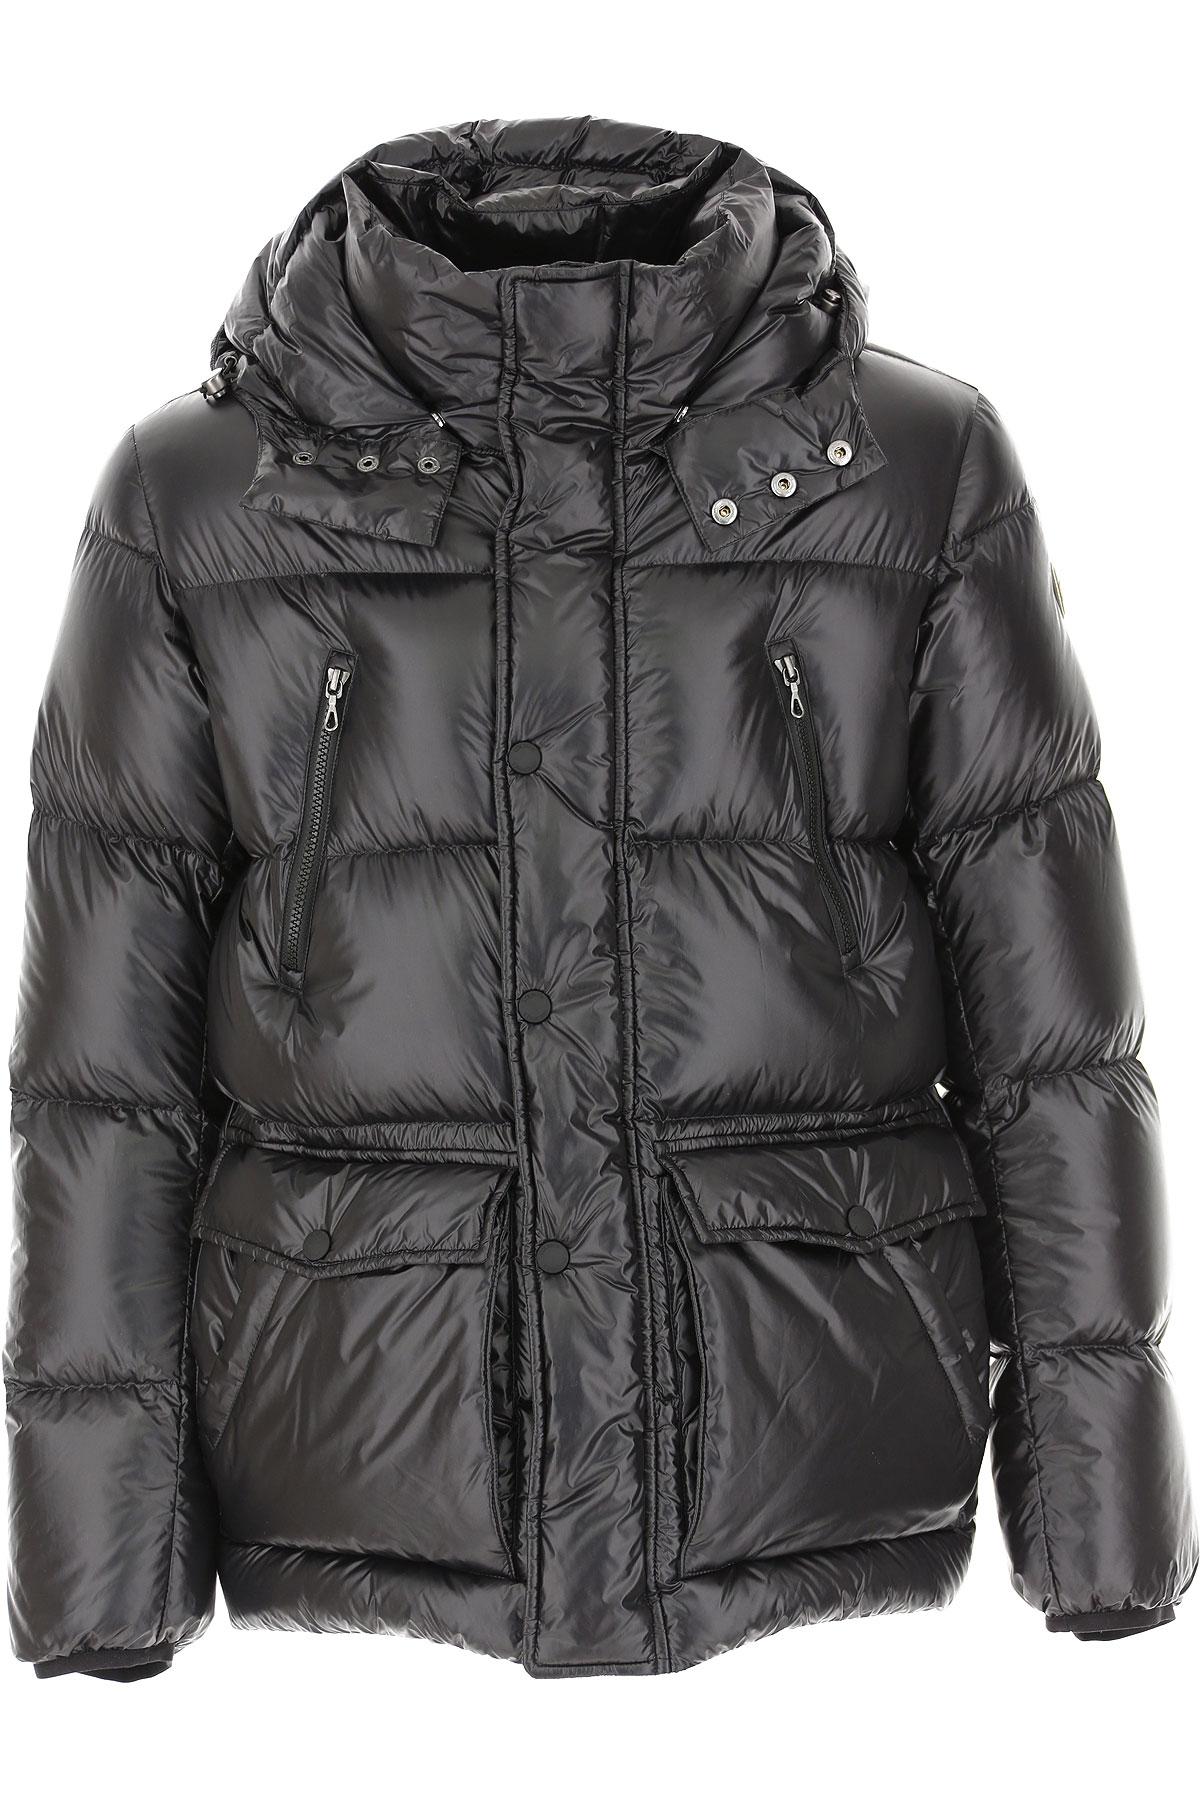 Colmar Down Jacket for Men, Puffer Ski Jacket On Sale, Black, polyamide, 2019, L M S XL XXL